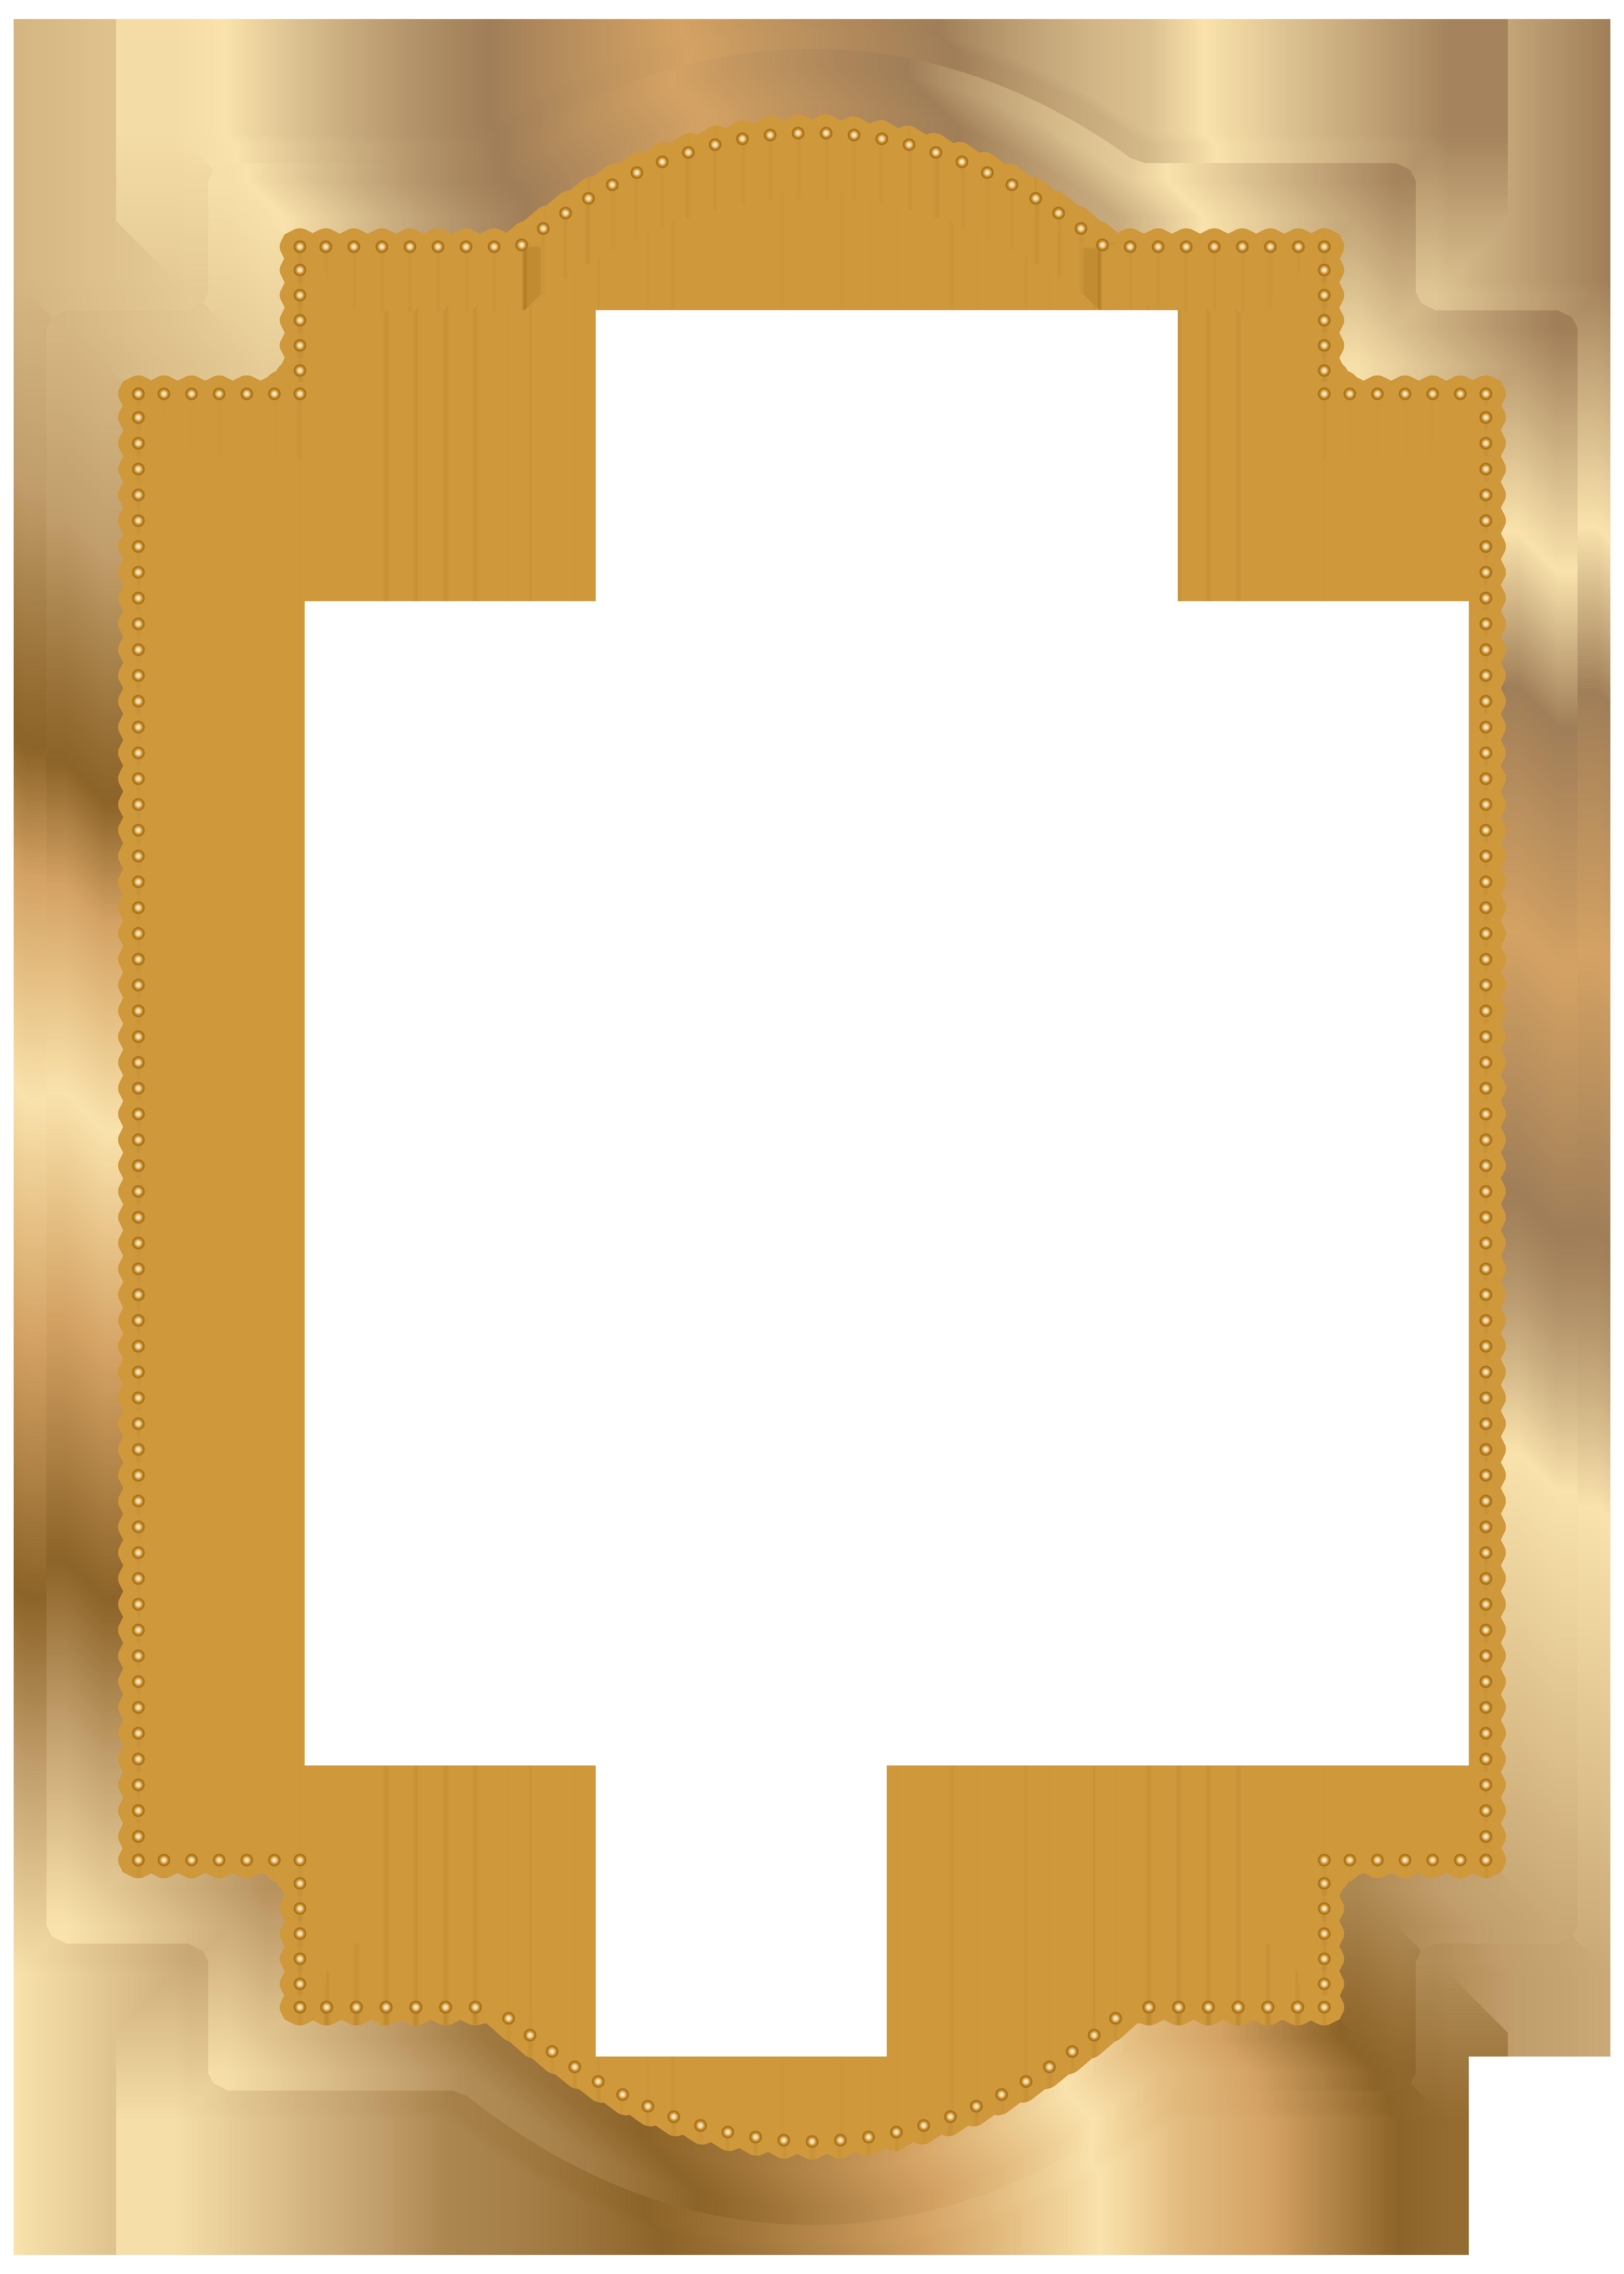 Ladybugs clipart border. Frame gold transparent clip